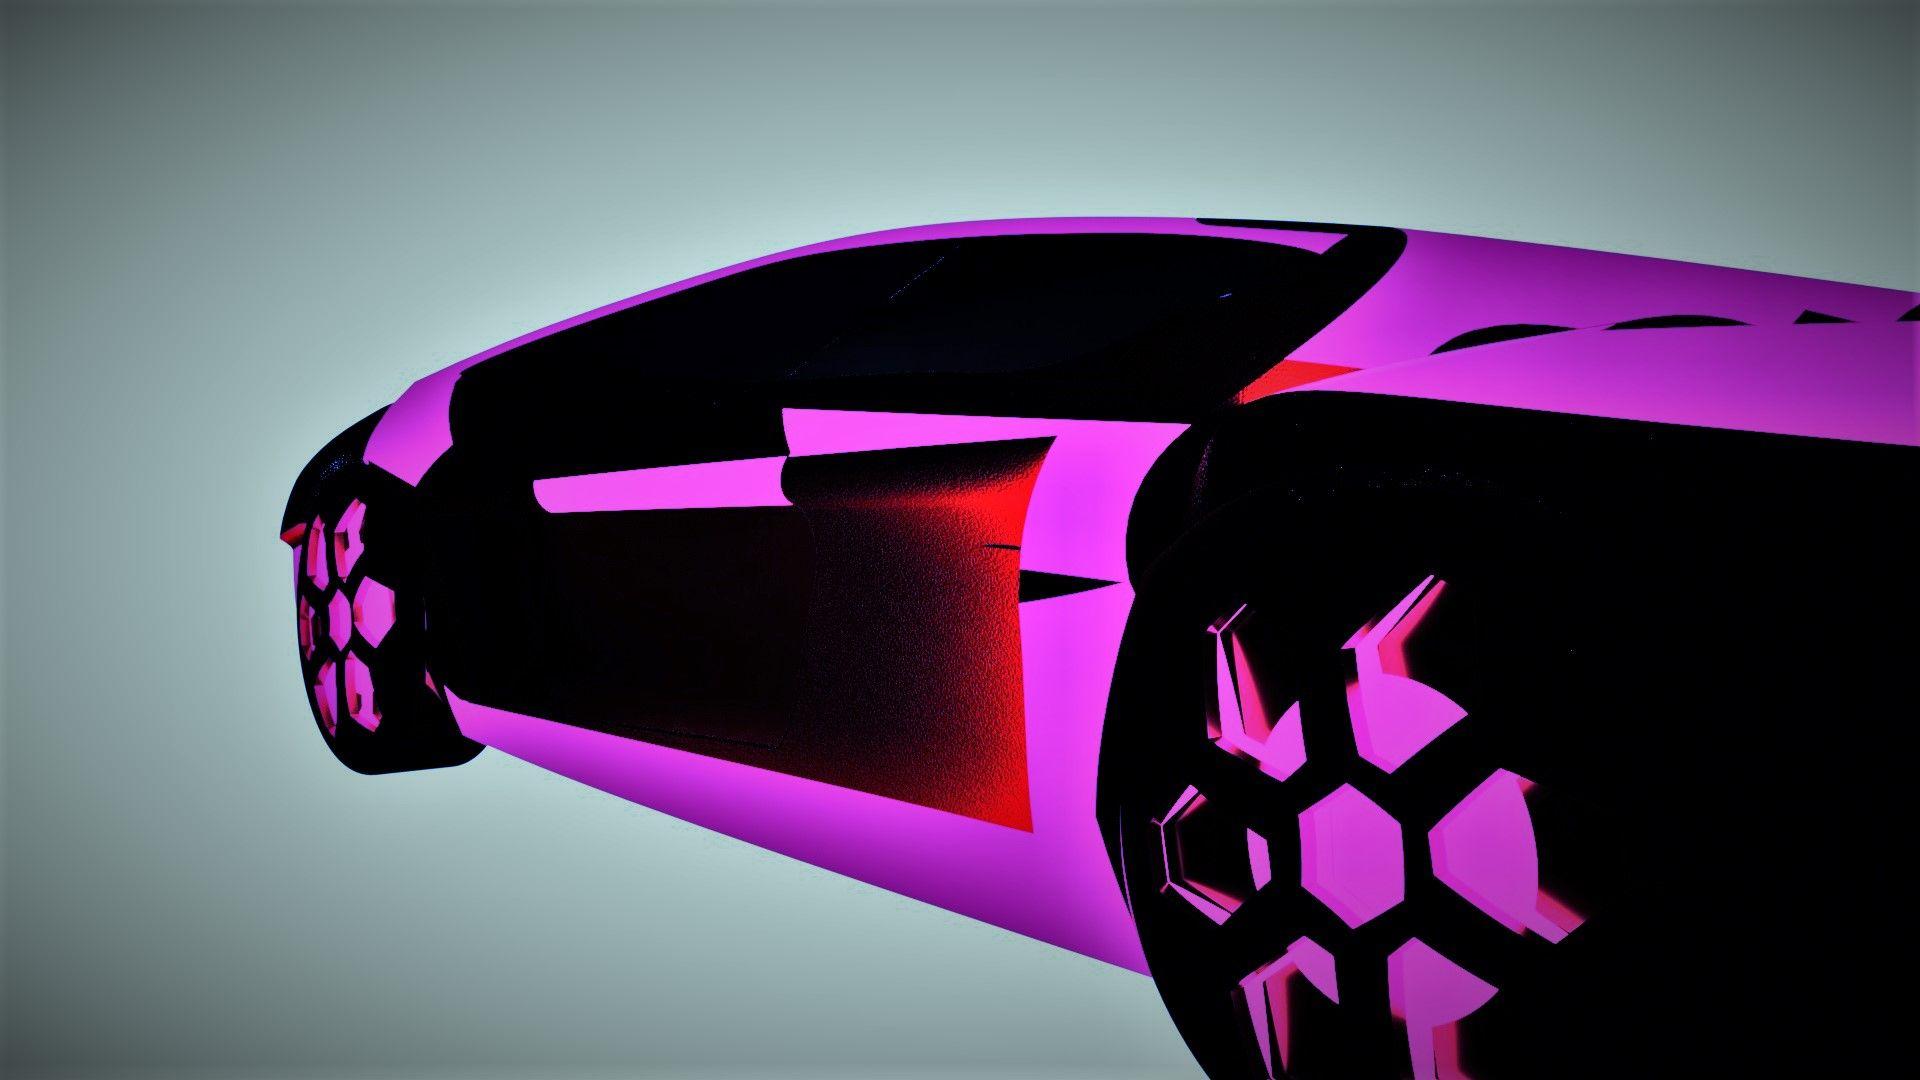 Lamborghini-2016-aug-21-12-10-01pm-000-customizedview22921769162-3-3500-3500